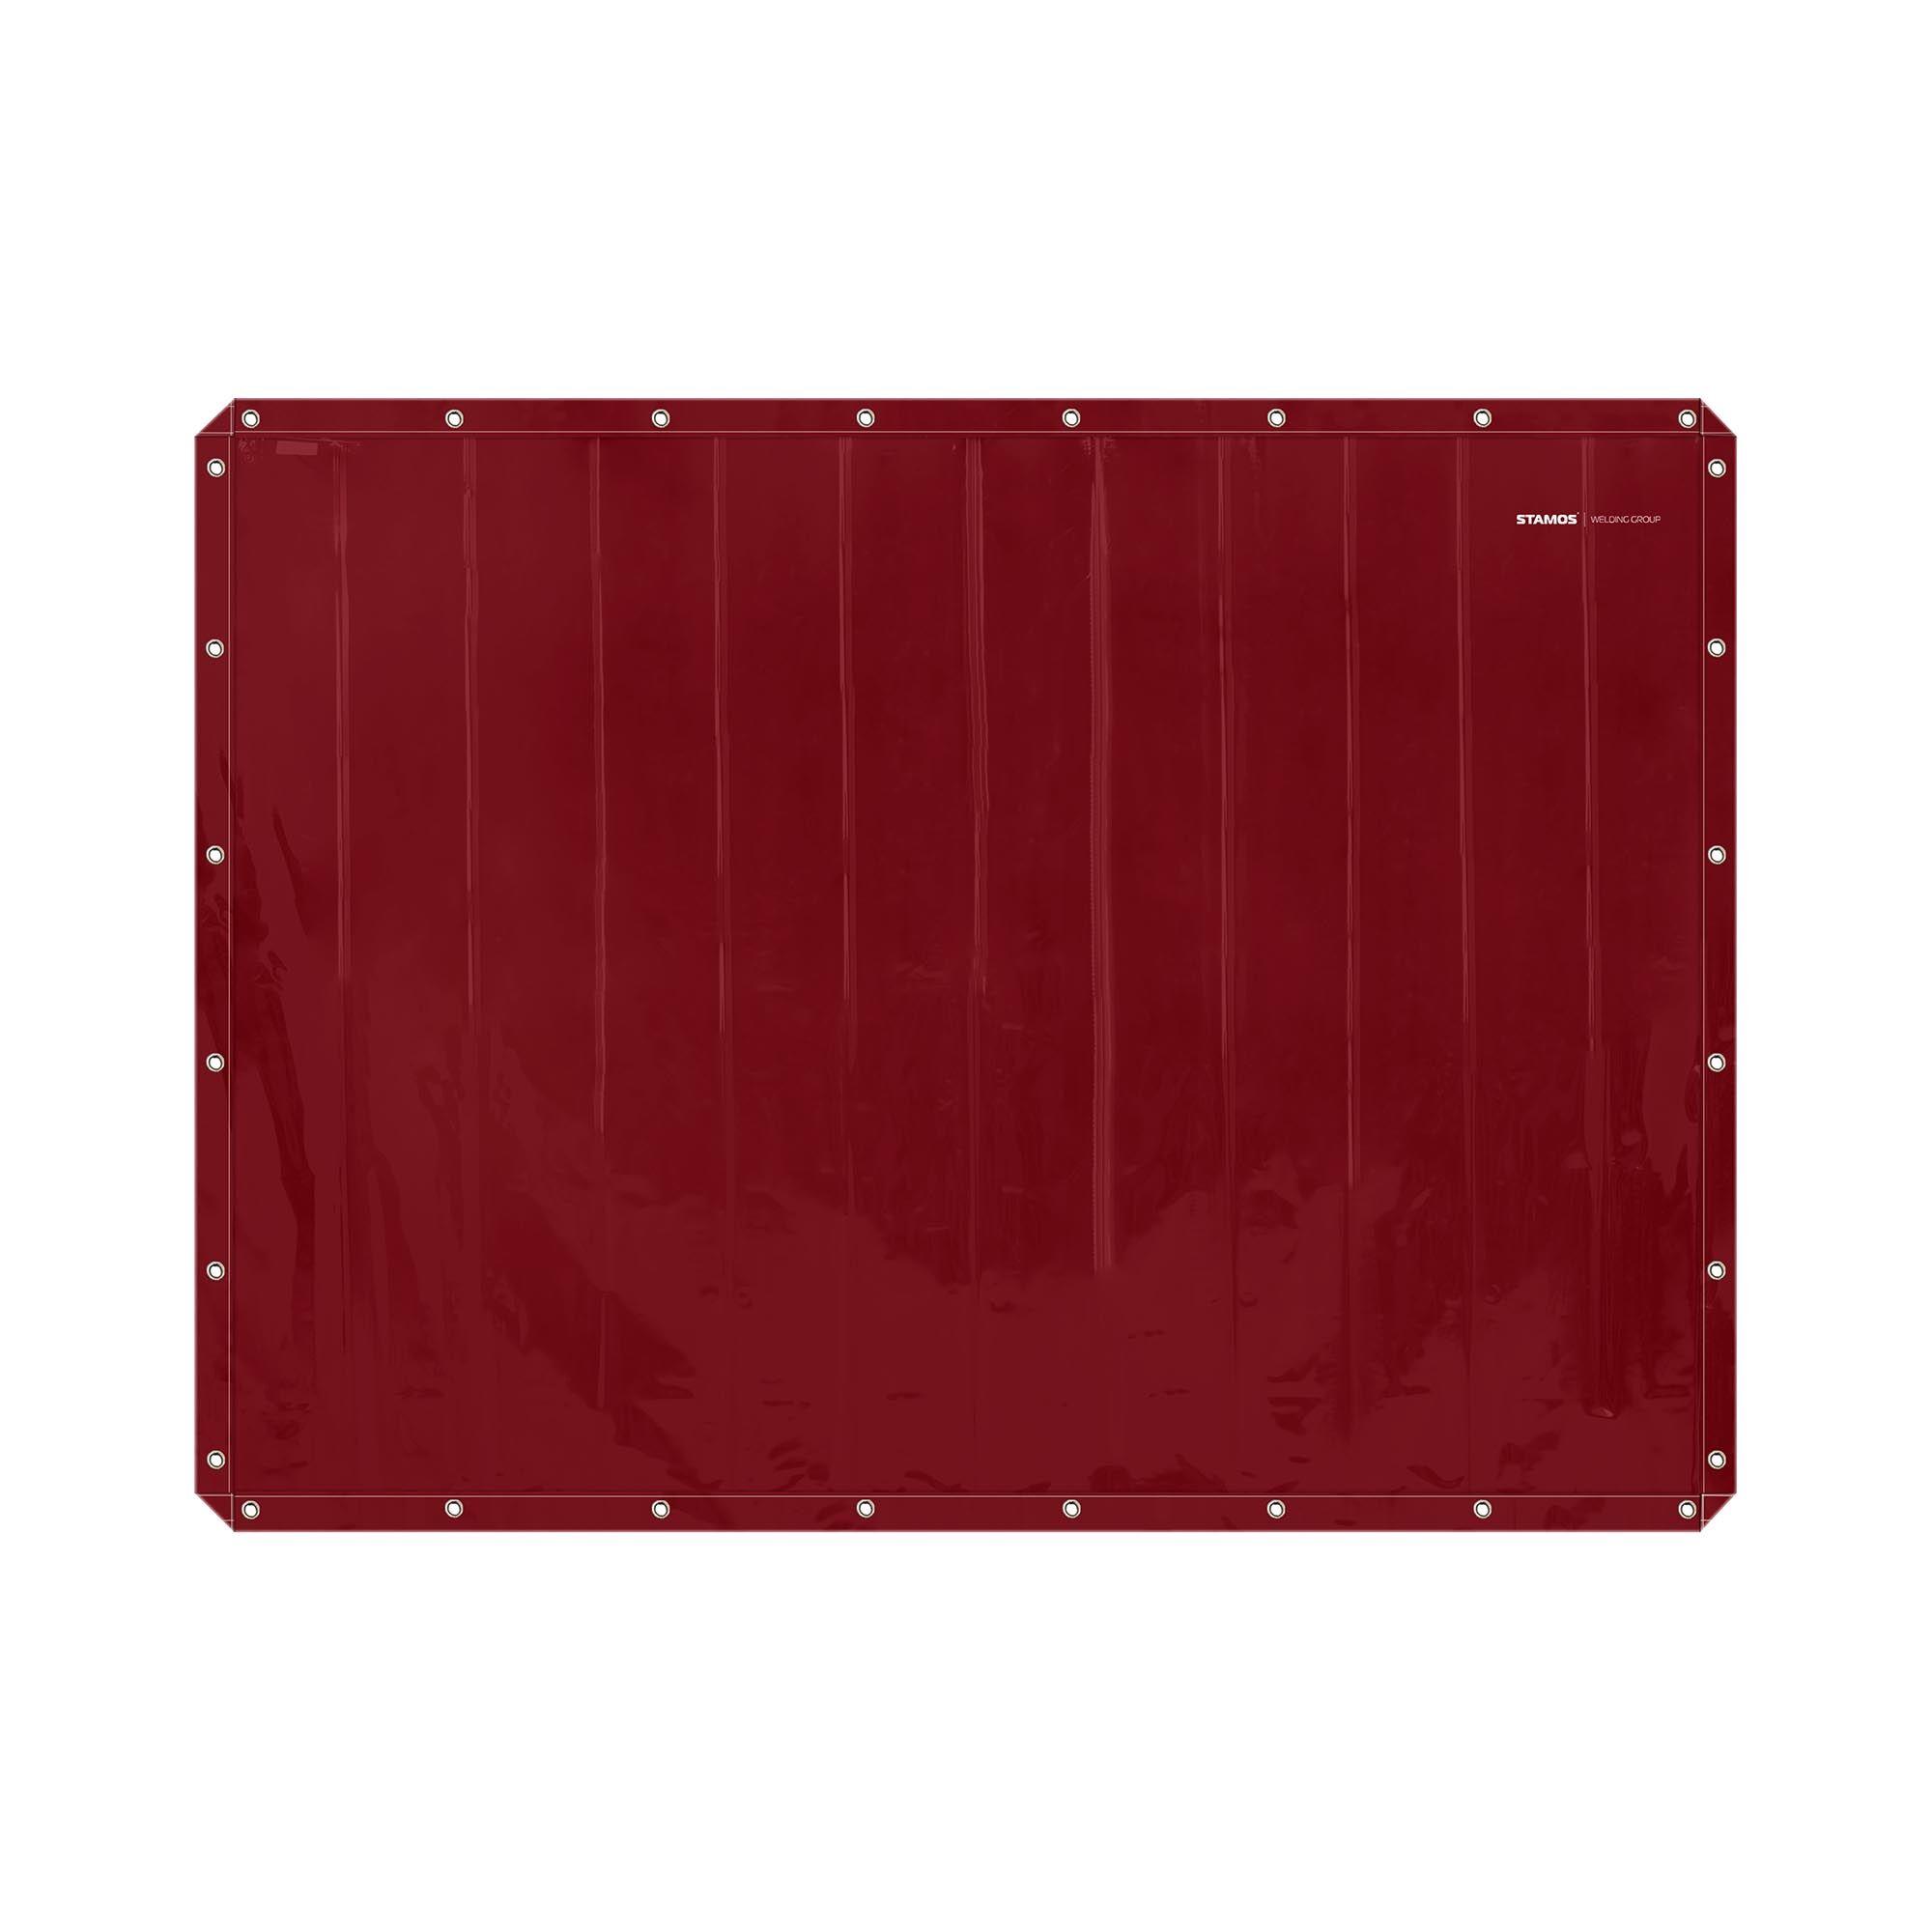 Stamos Welding Group Rideau de soudure - 239 x 175 cm SWS03